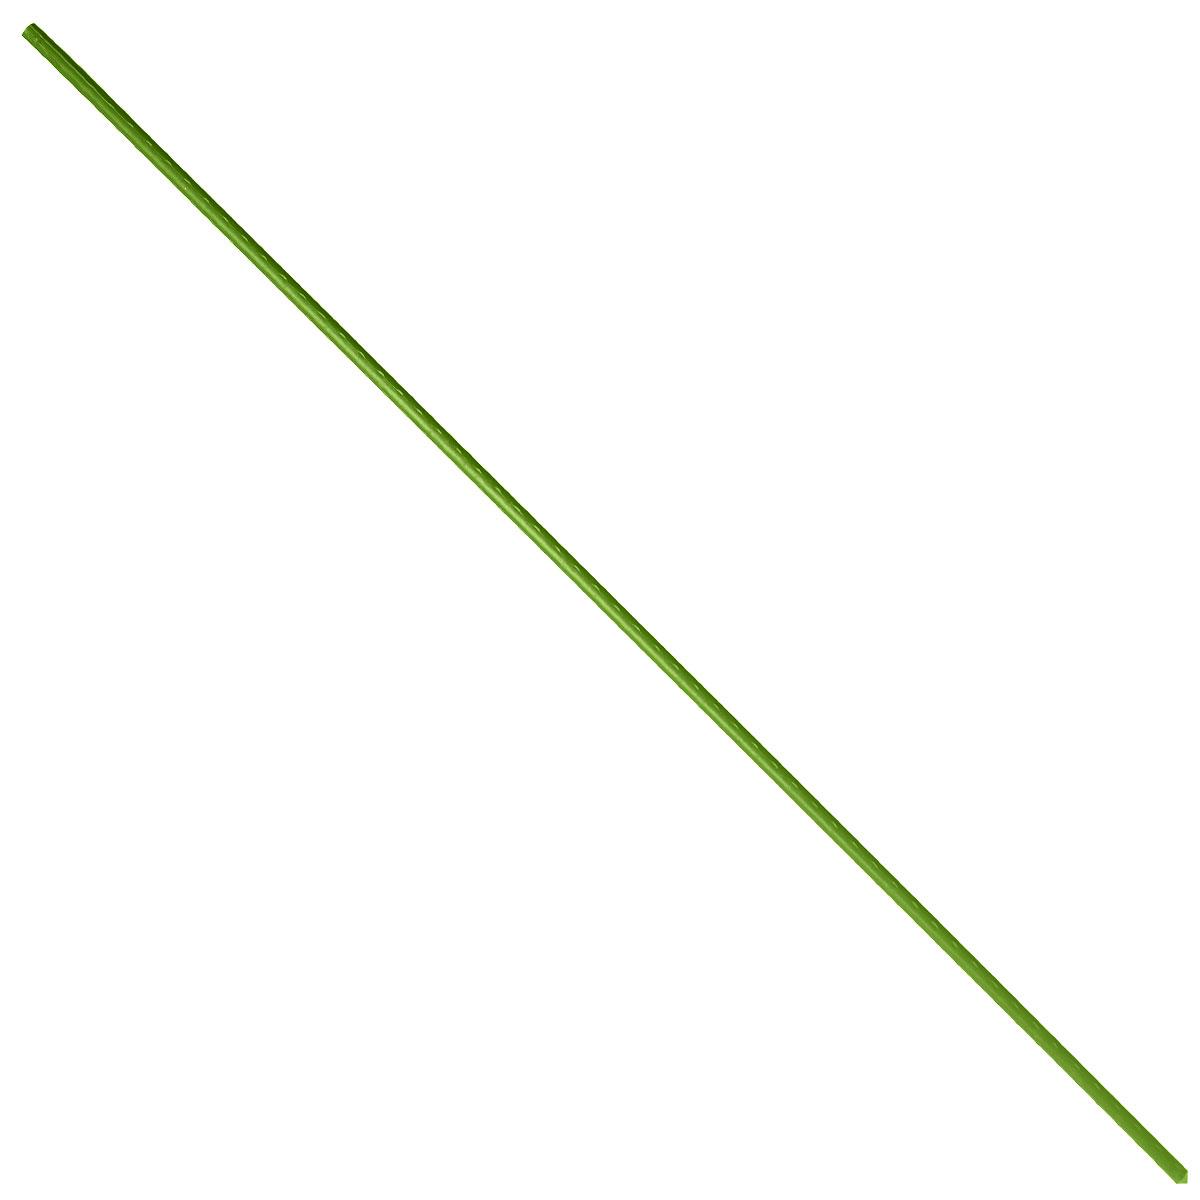 Опора для растений Green Apple, цвет: зеленый, диаметр 1,1 см, длина 90 см, 5 шт опора для растений green apple бамбуковая диаметр 1 см длина 75 см 5 шт